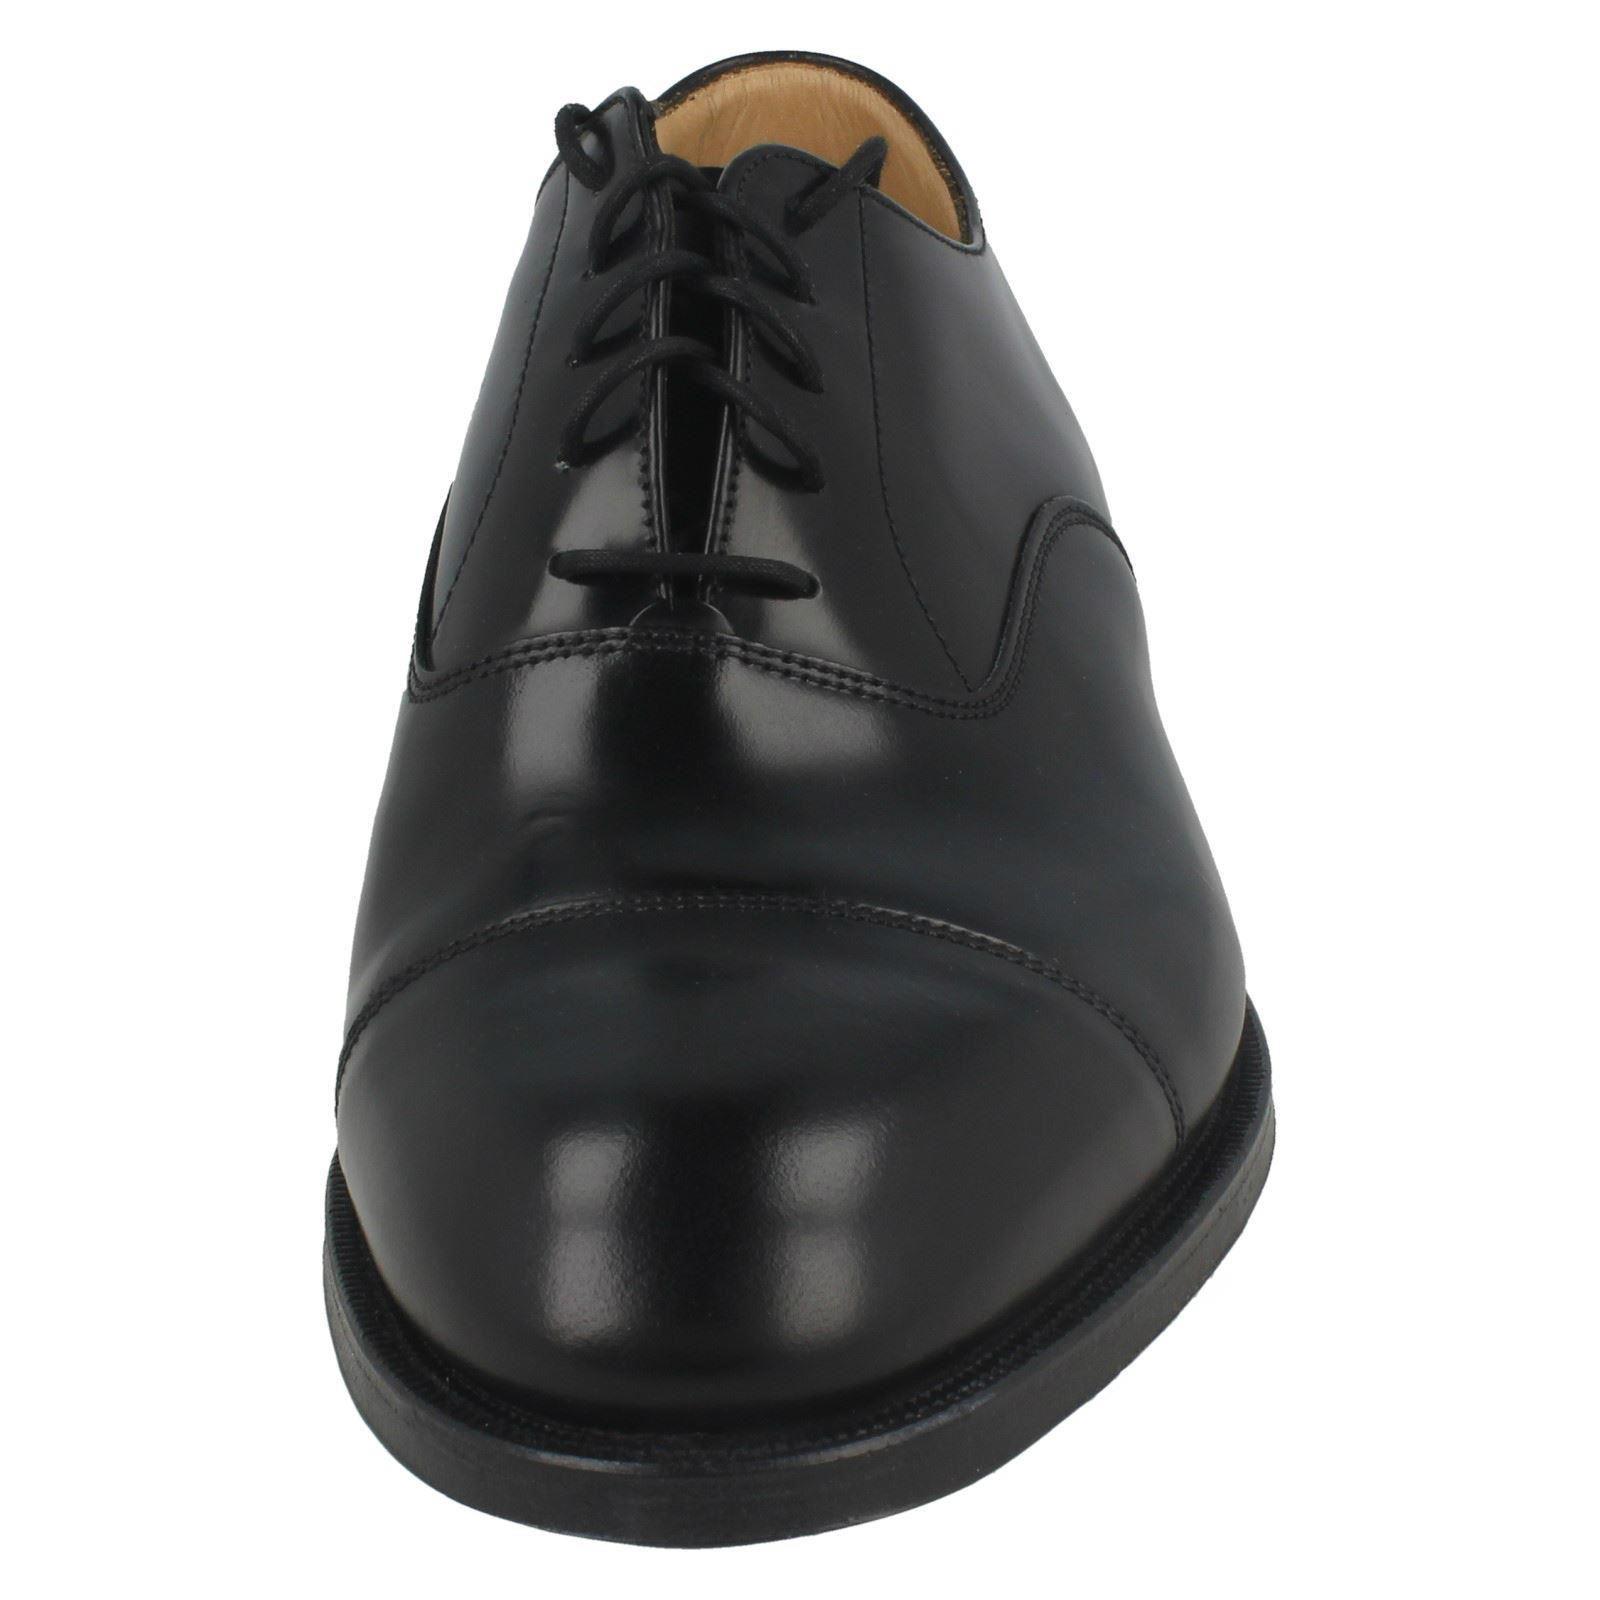 Scarpe da Uomo Grenson Formale-Dundee Formale-Dundee Formale-Dundee 6d7e5d